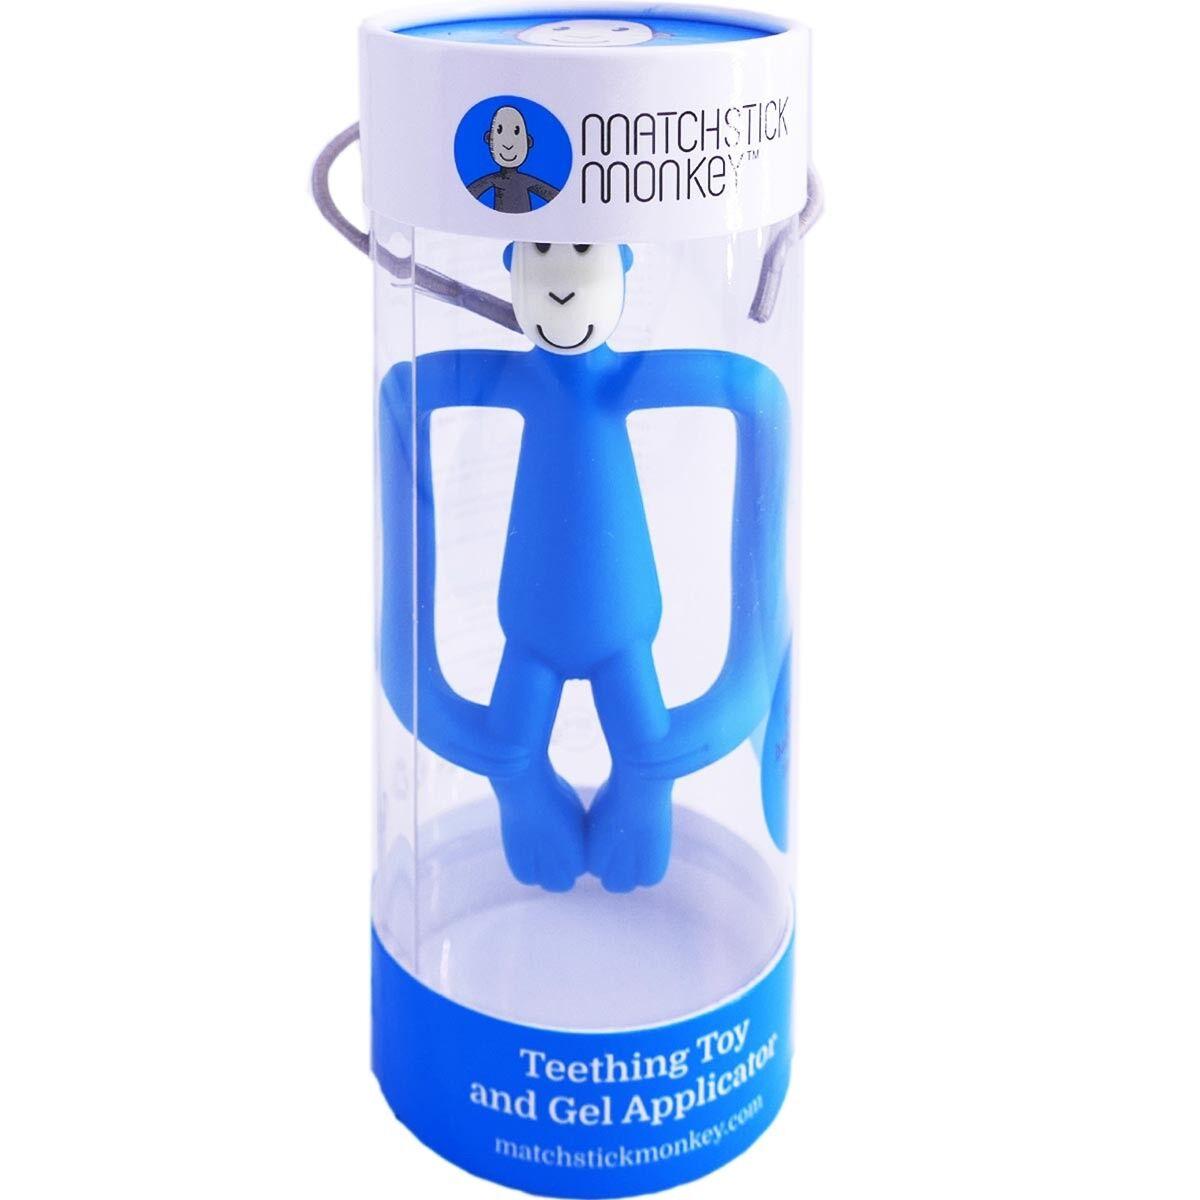 Matchstick monkey anneau dentition singe bleu